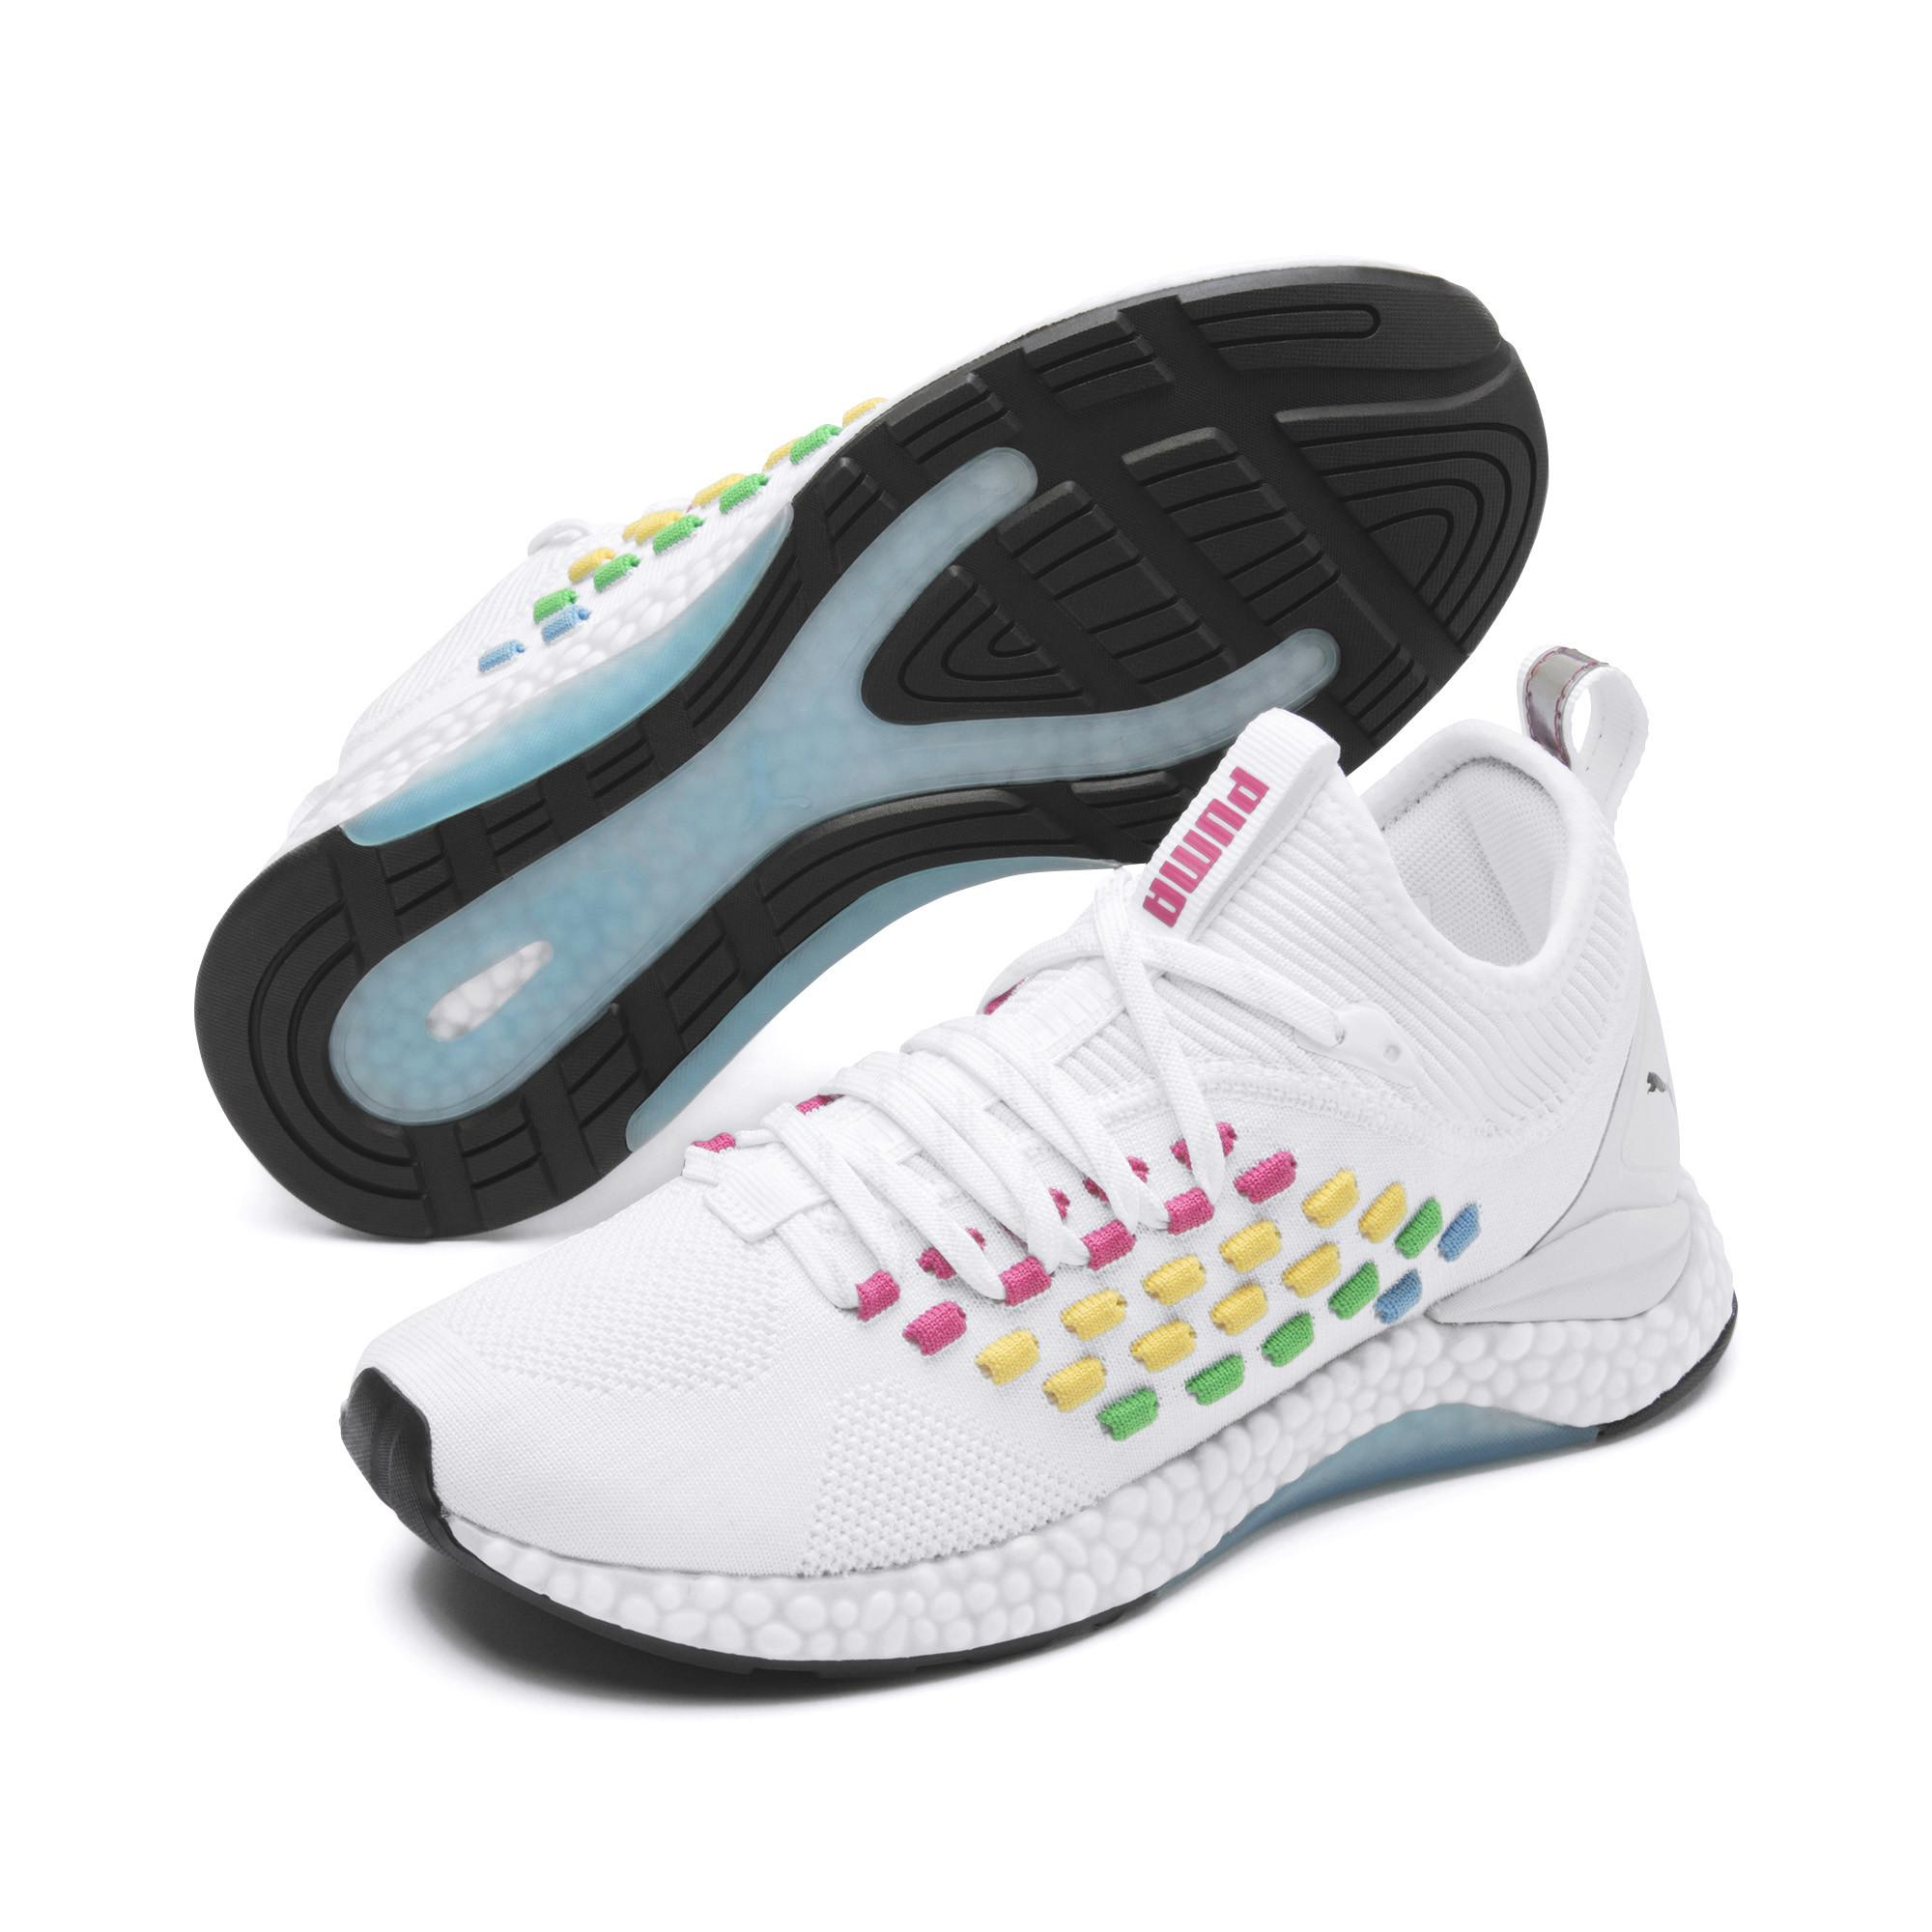 PUMA - White Fusefit Heatmap Women s Running Shoes - Lyst. View fullscreen be17d2c21